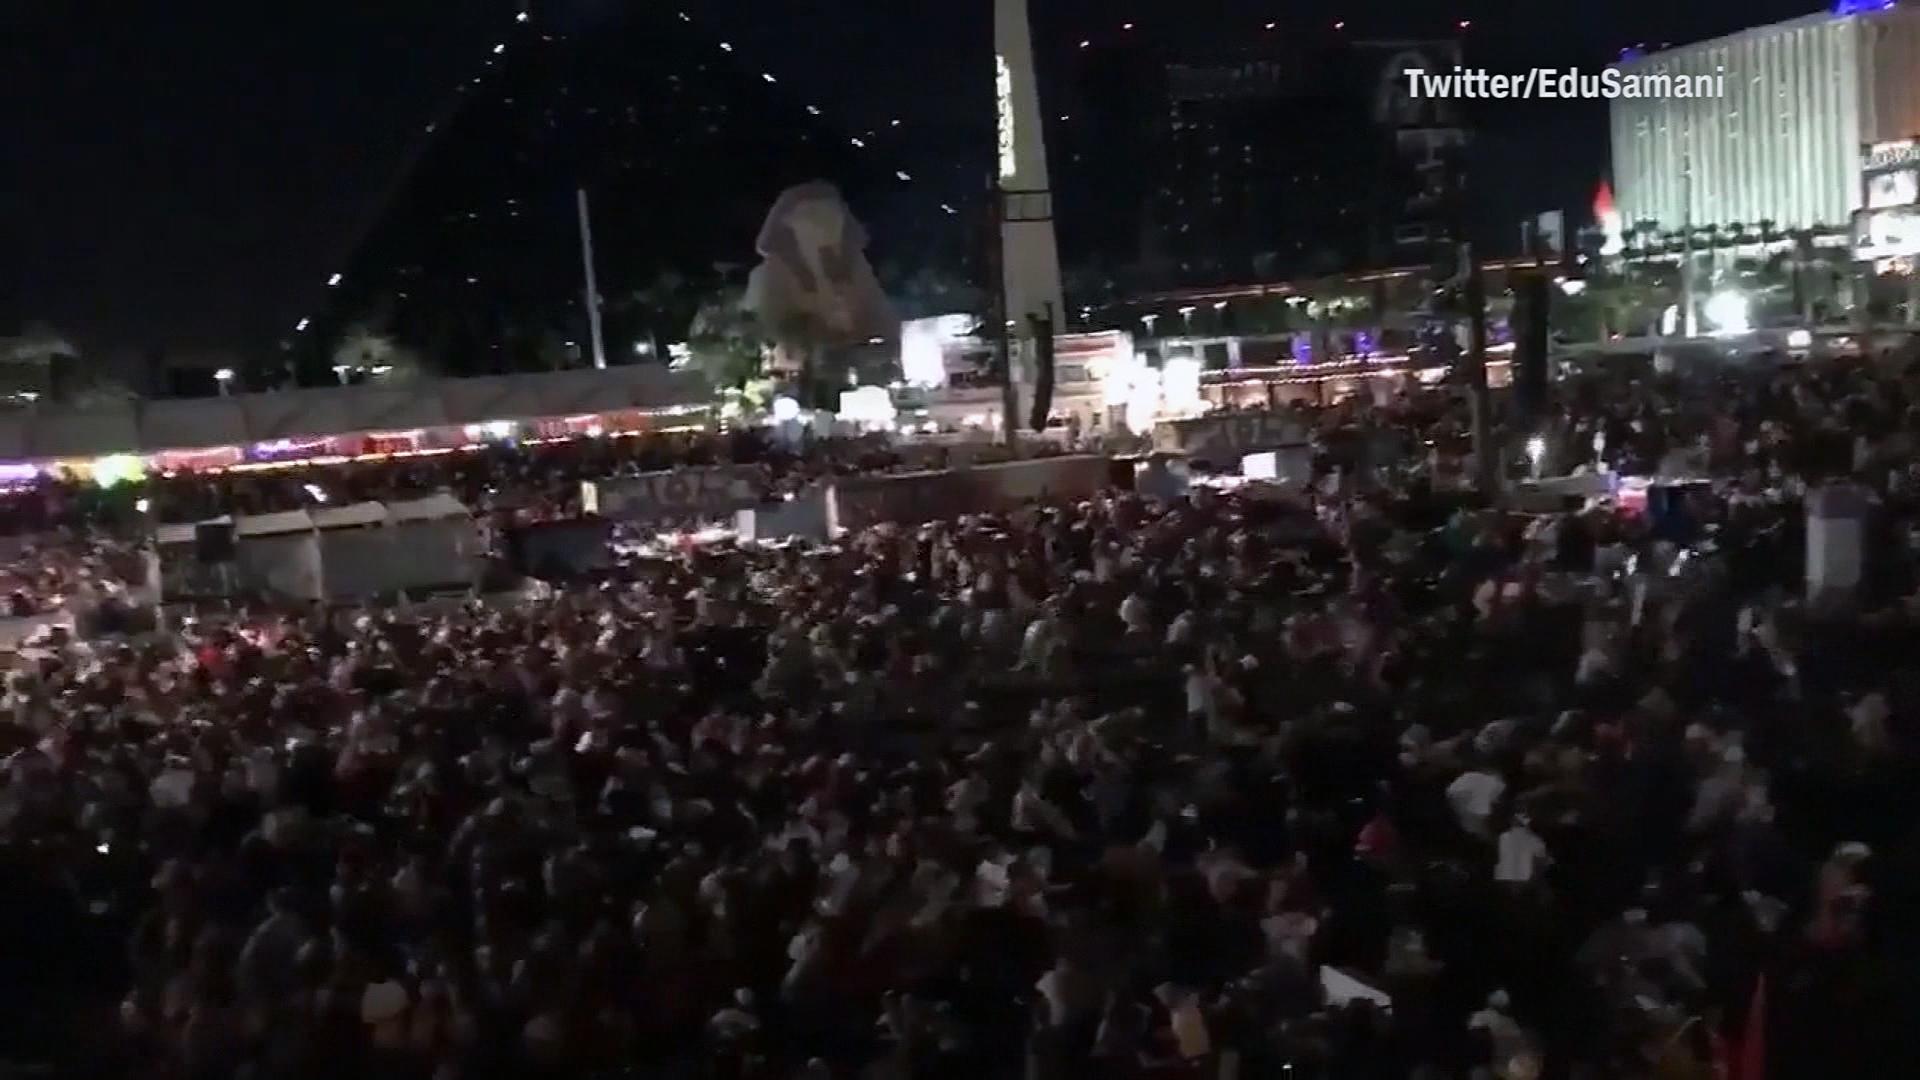 Las Vegas shooting Twitter video from CNN PKG-159532.jpg52019344